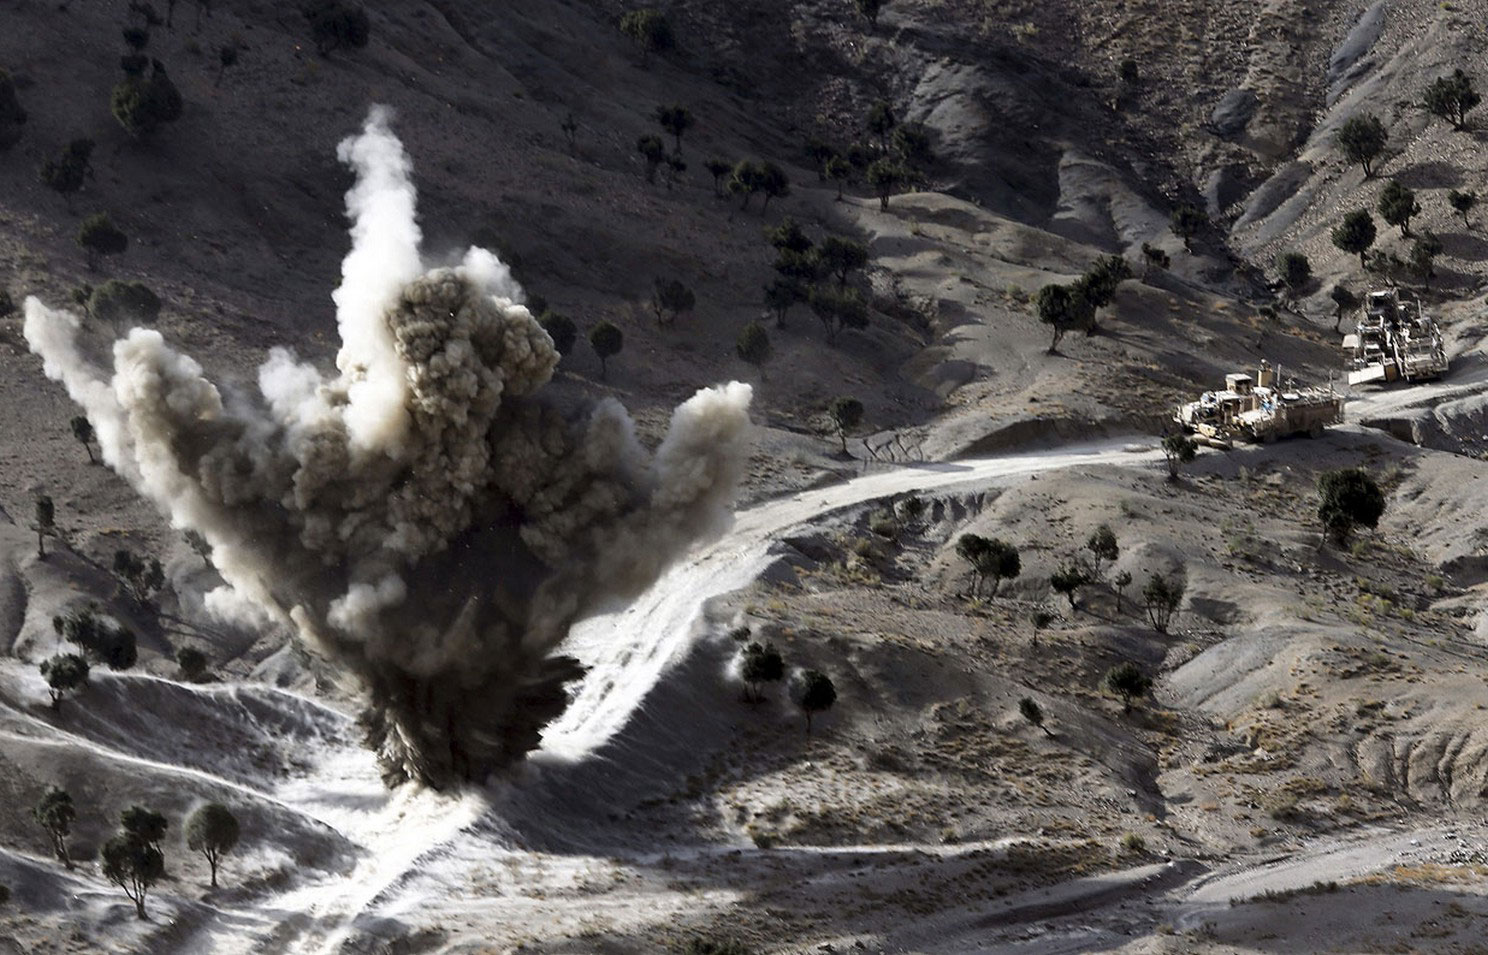 бомба установленная талибами в Афганистане